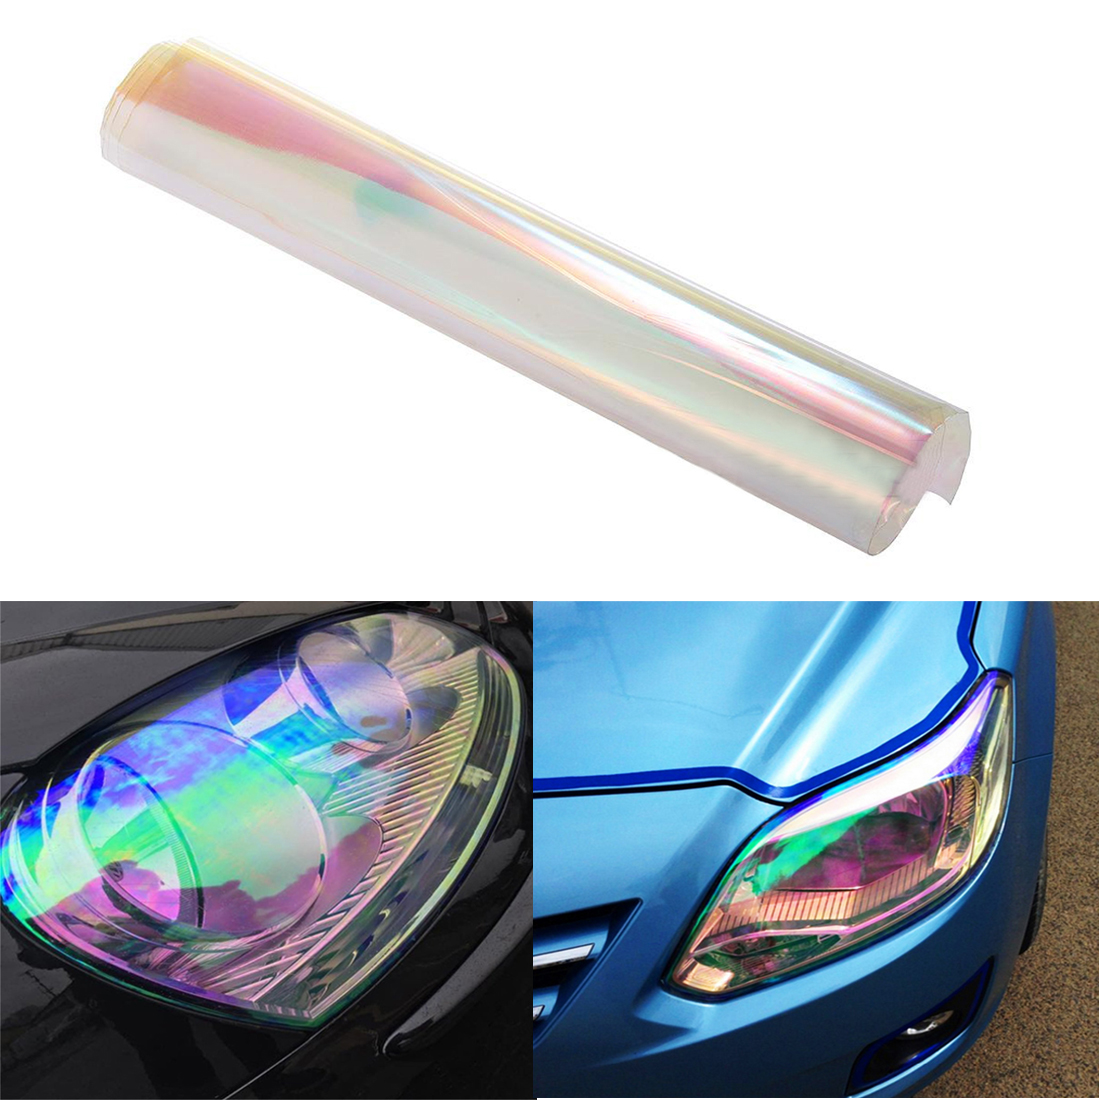 30*200 CM Car Body Chameleon Colorful Clear Film Vinyl Wrap Headlight Film New